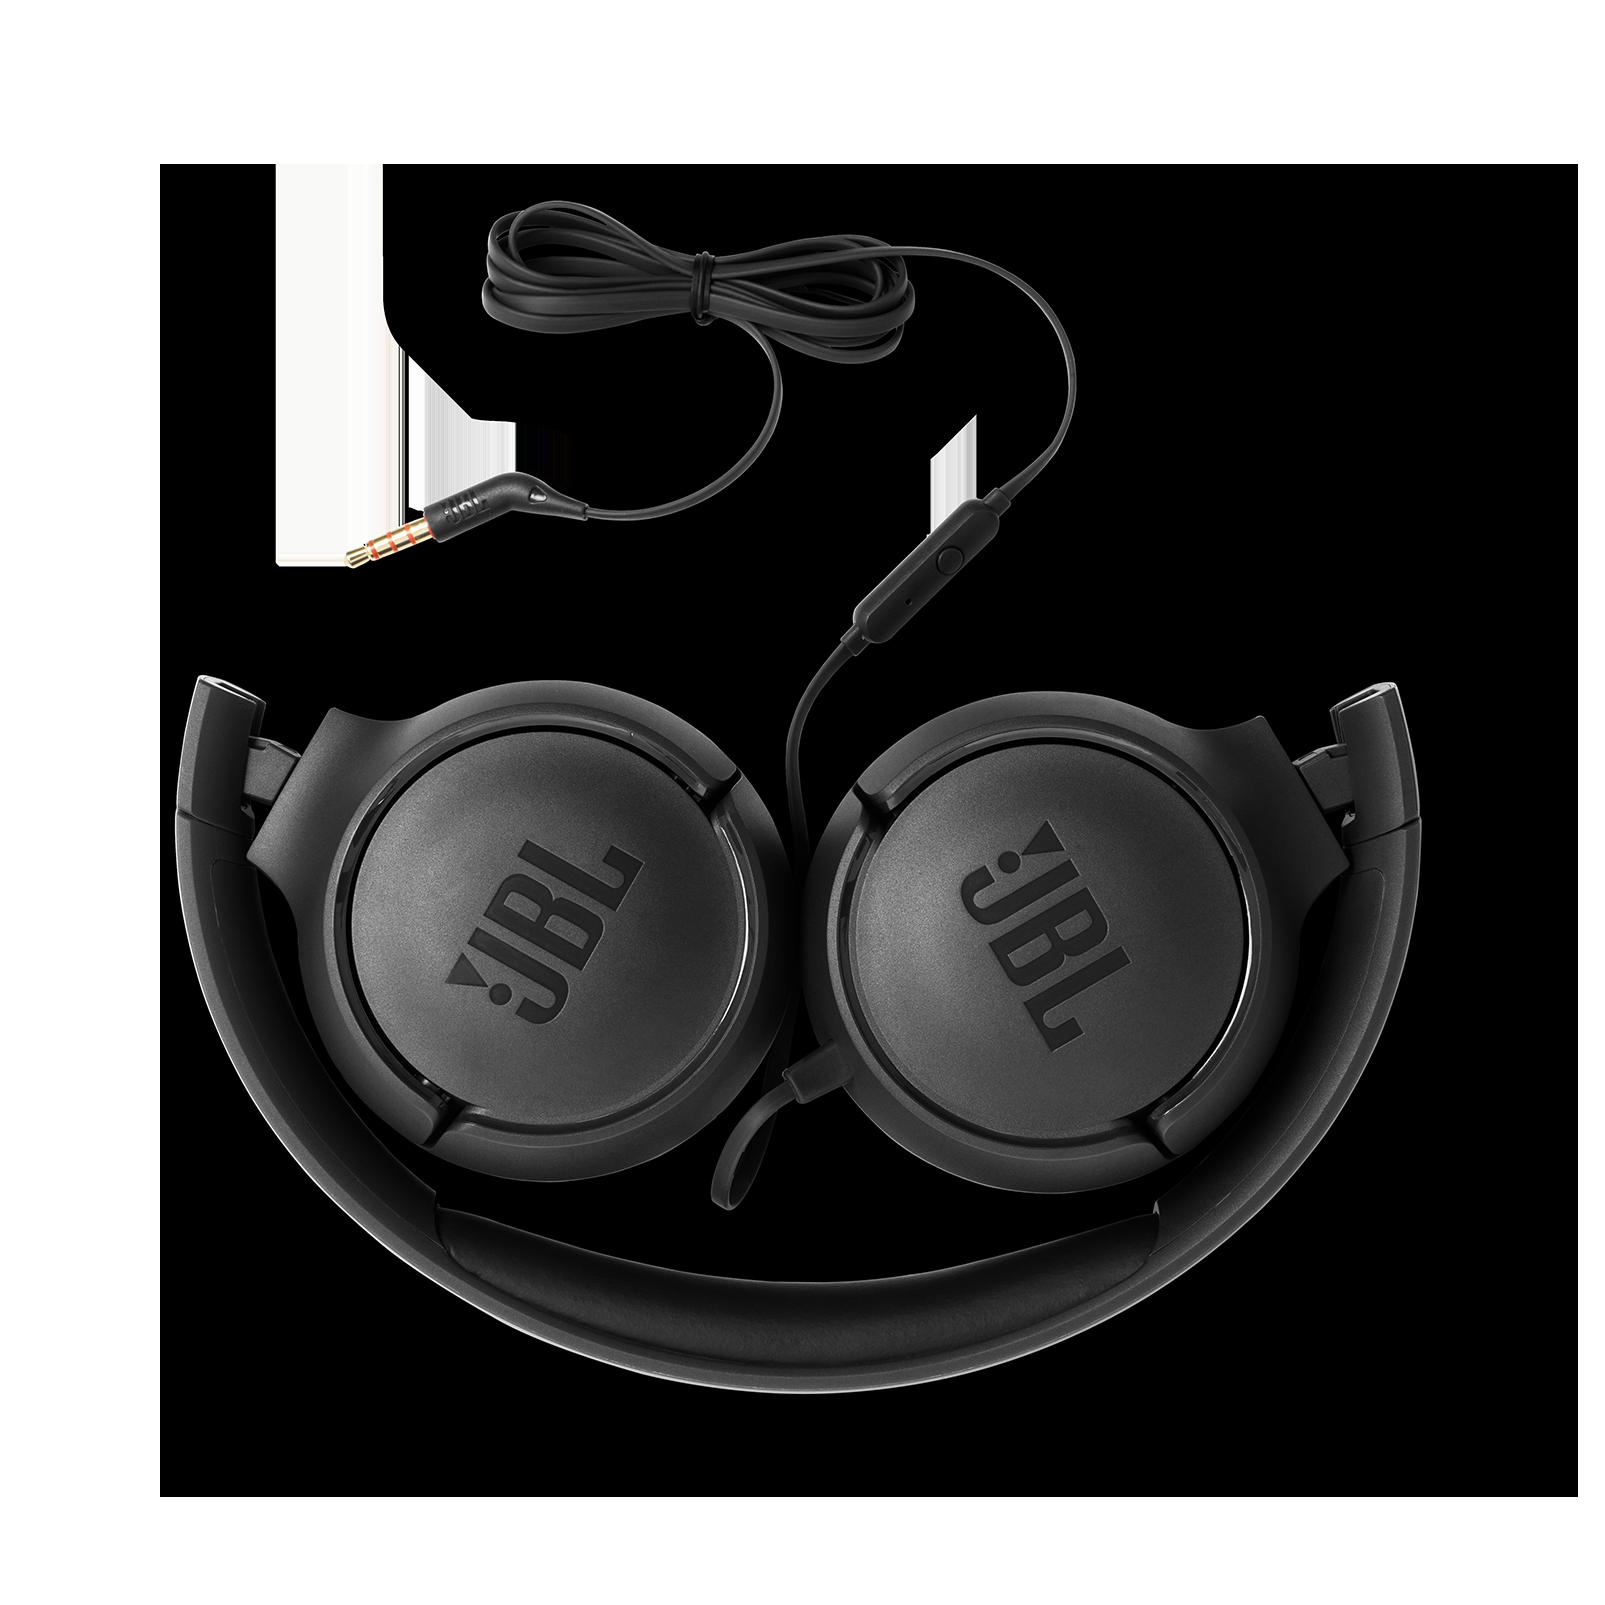 8e508eafaa4 JBL TUNE 500 | Wired on-ear headphones